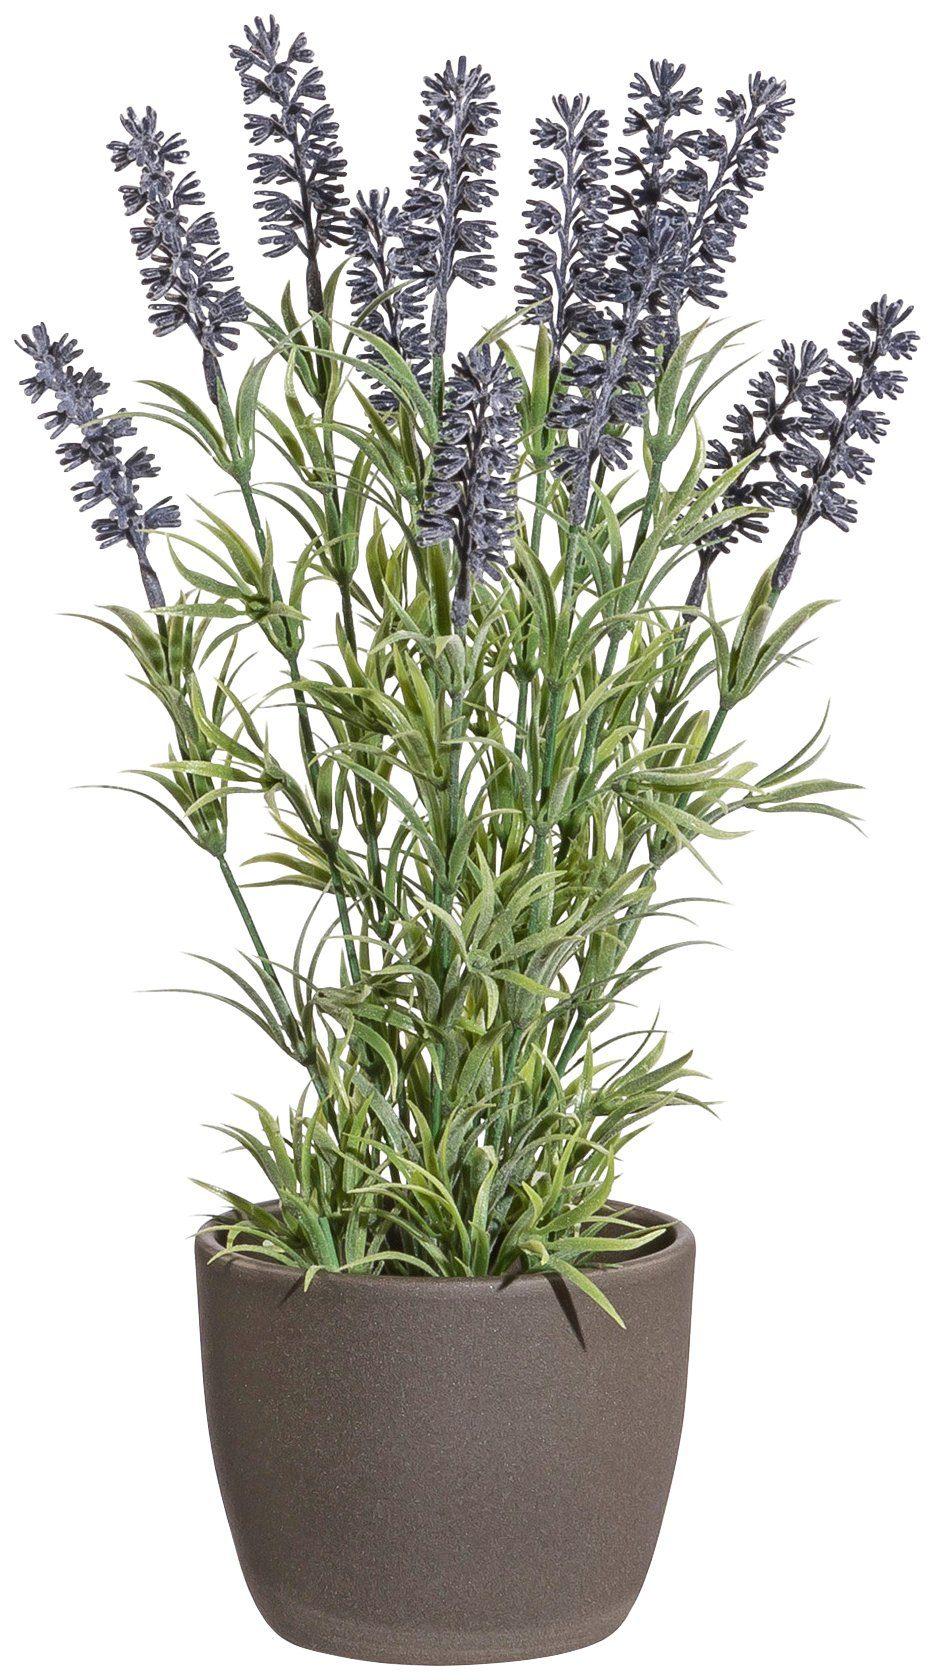 Kunstpflanze »Lavendel«, im Keramiktopf, Höhe 37 cm, lila